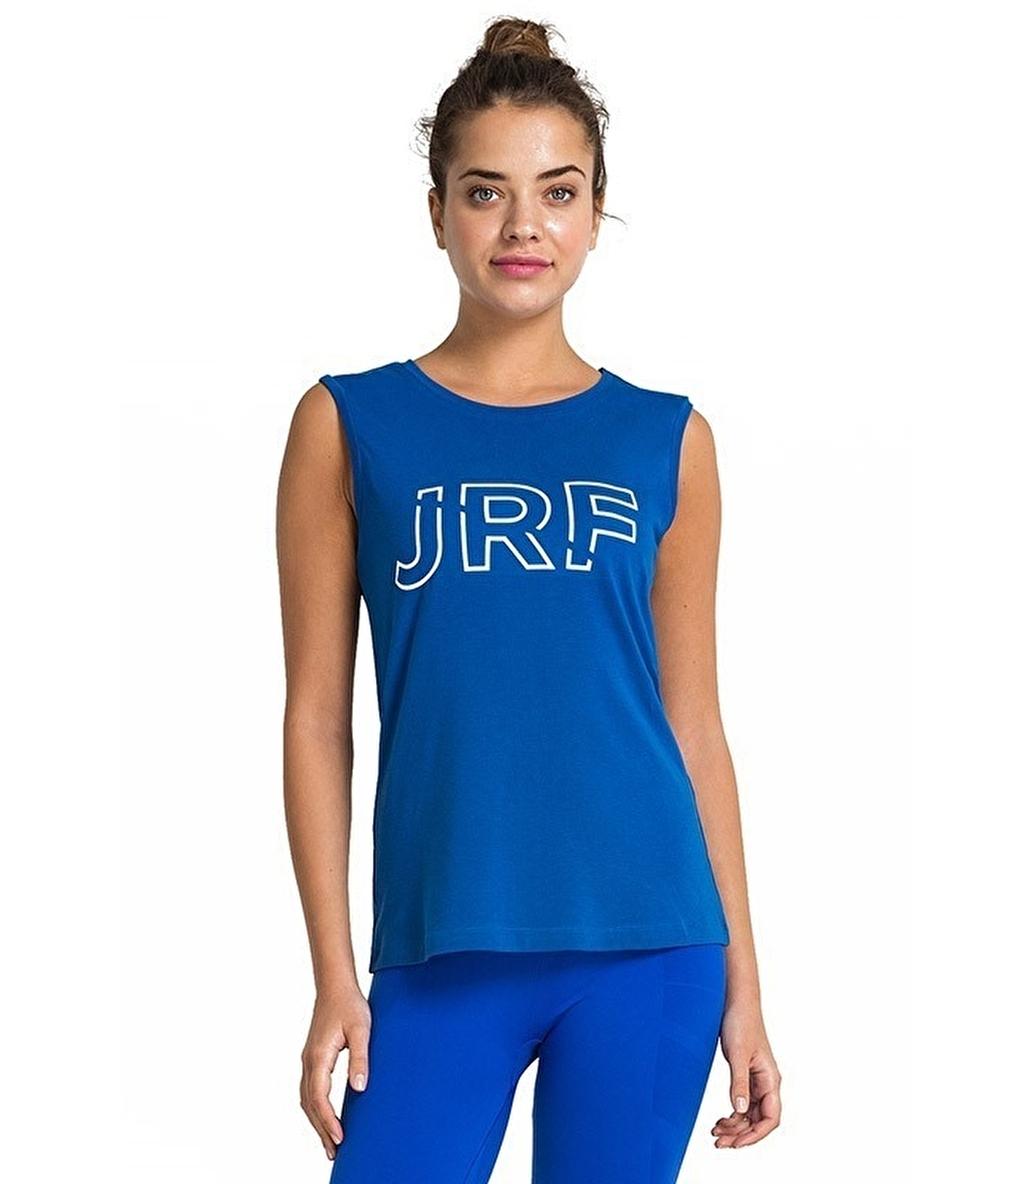 Jerf Cusco Atlet Mavi